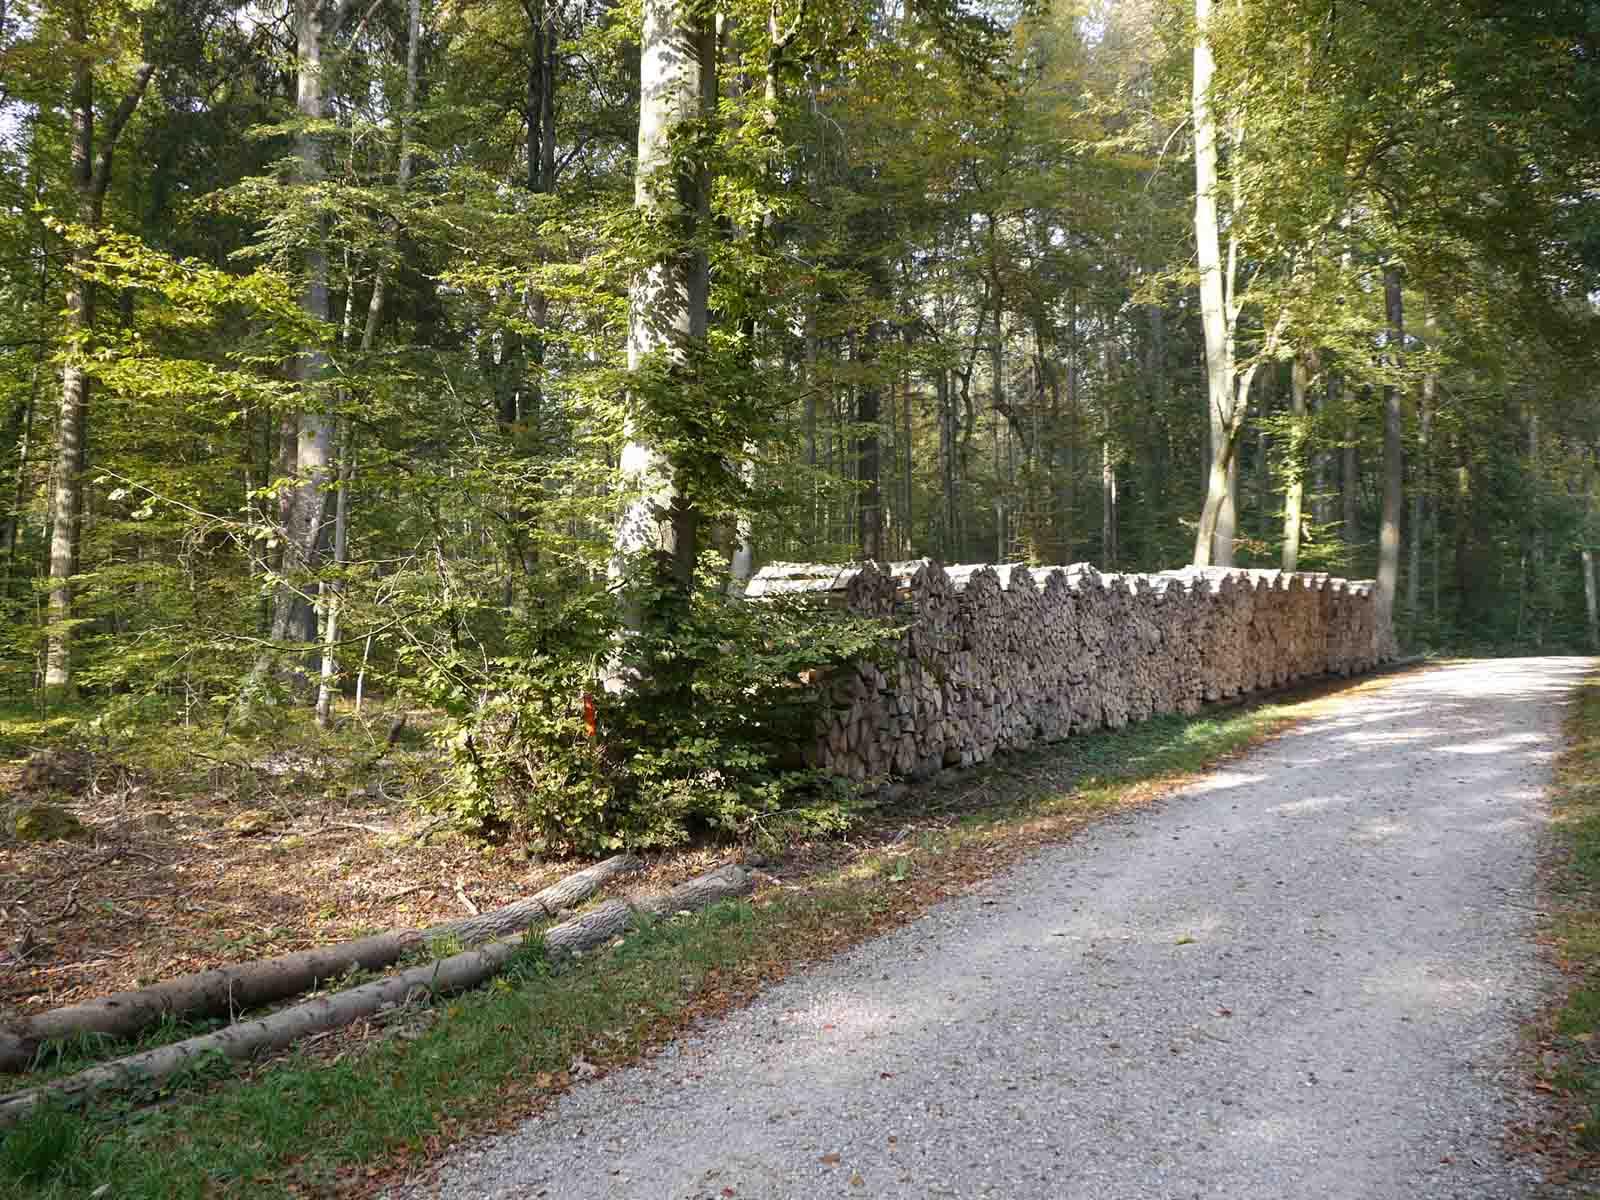 Brennholz eines privaten Waldeigentümers, gelagert an der Hungerbergstrasse.